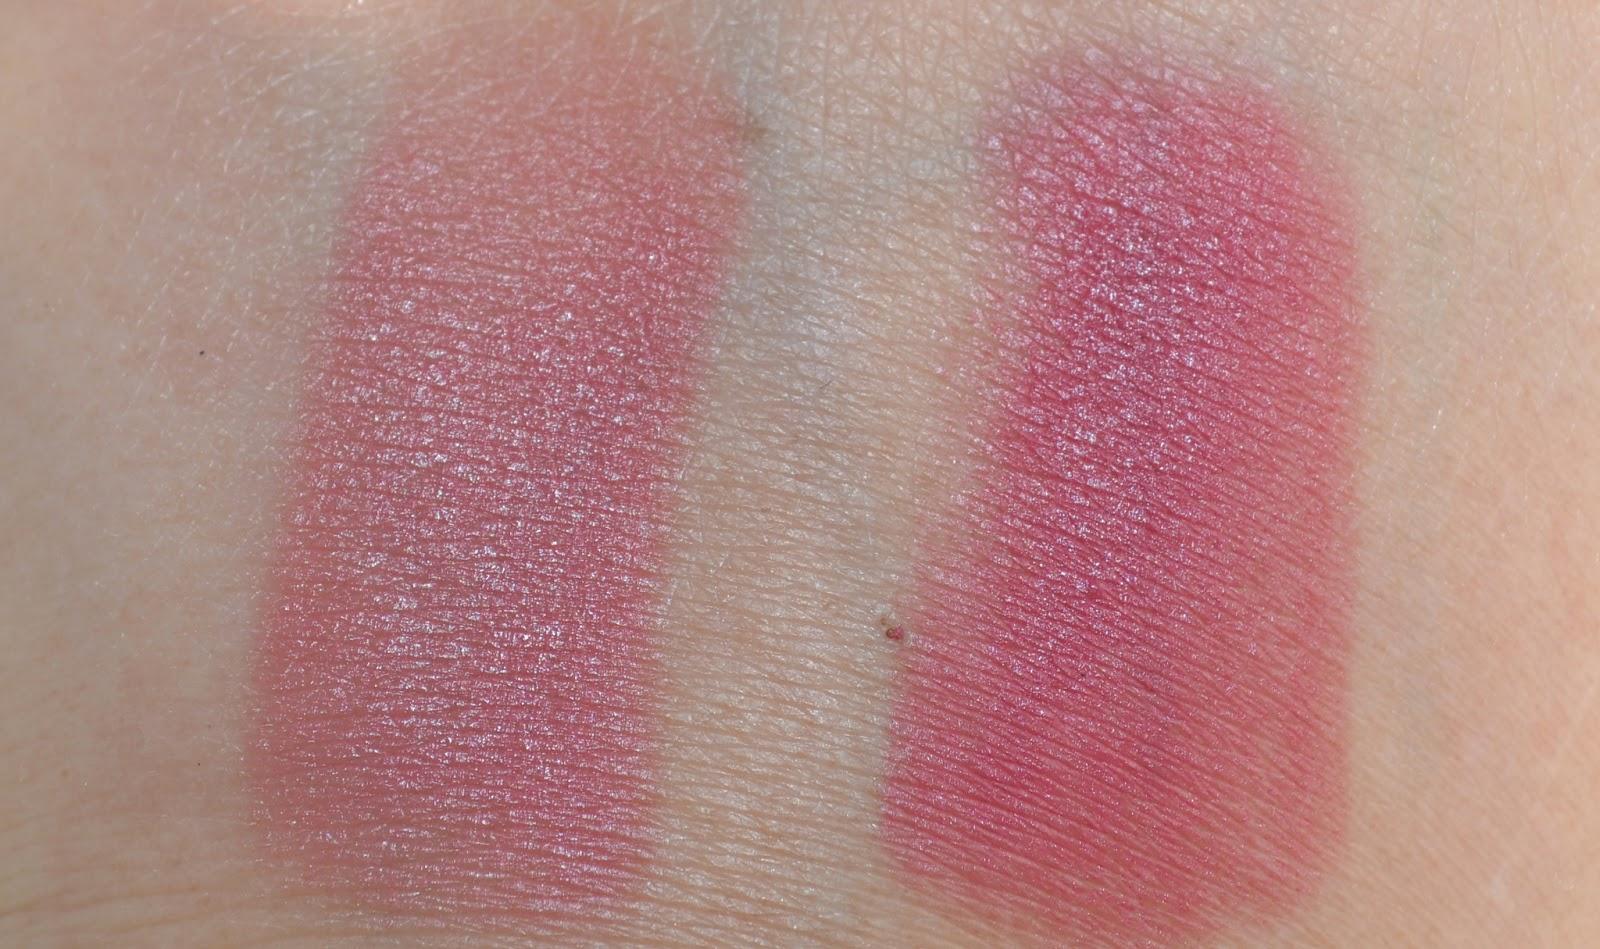 Aquaheart Flower Beauty Kiss Stick Velvet Lip Colors 2 Shades